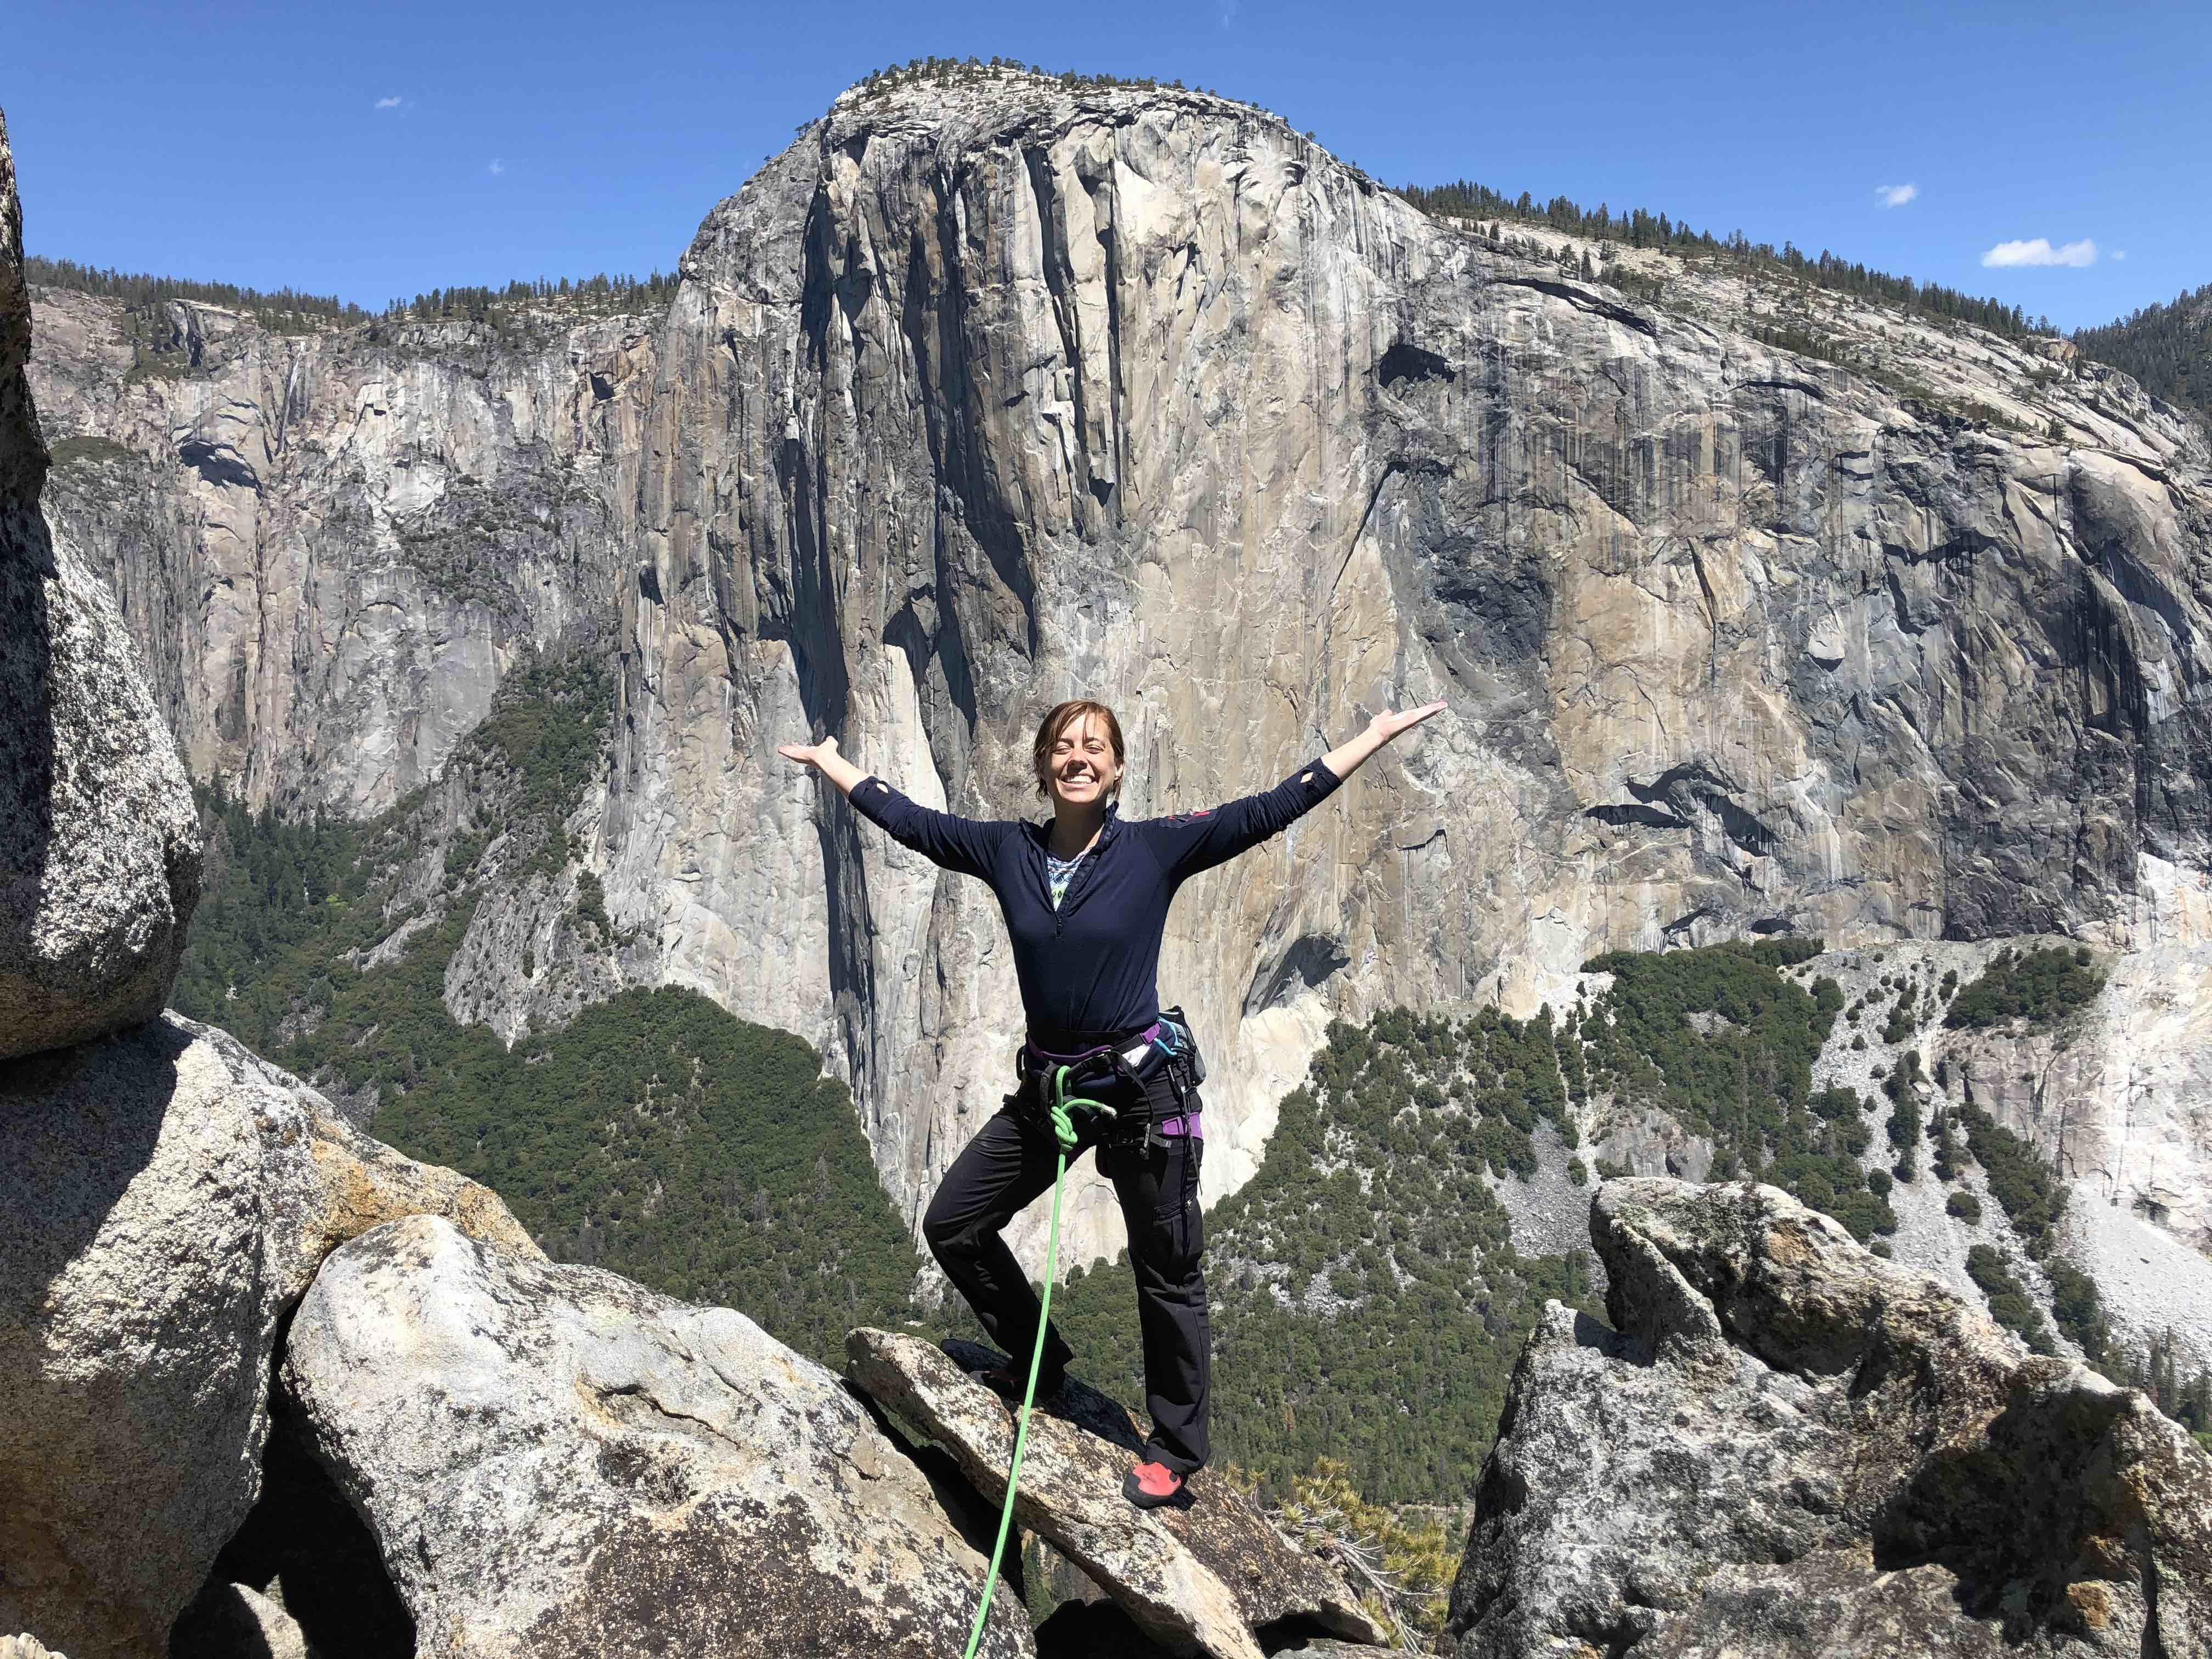 Melinda rock climbing